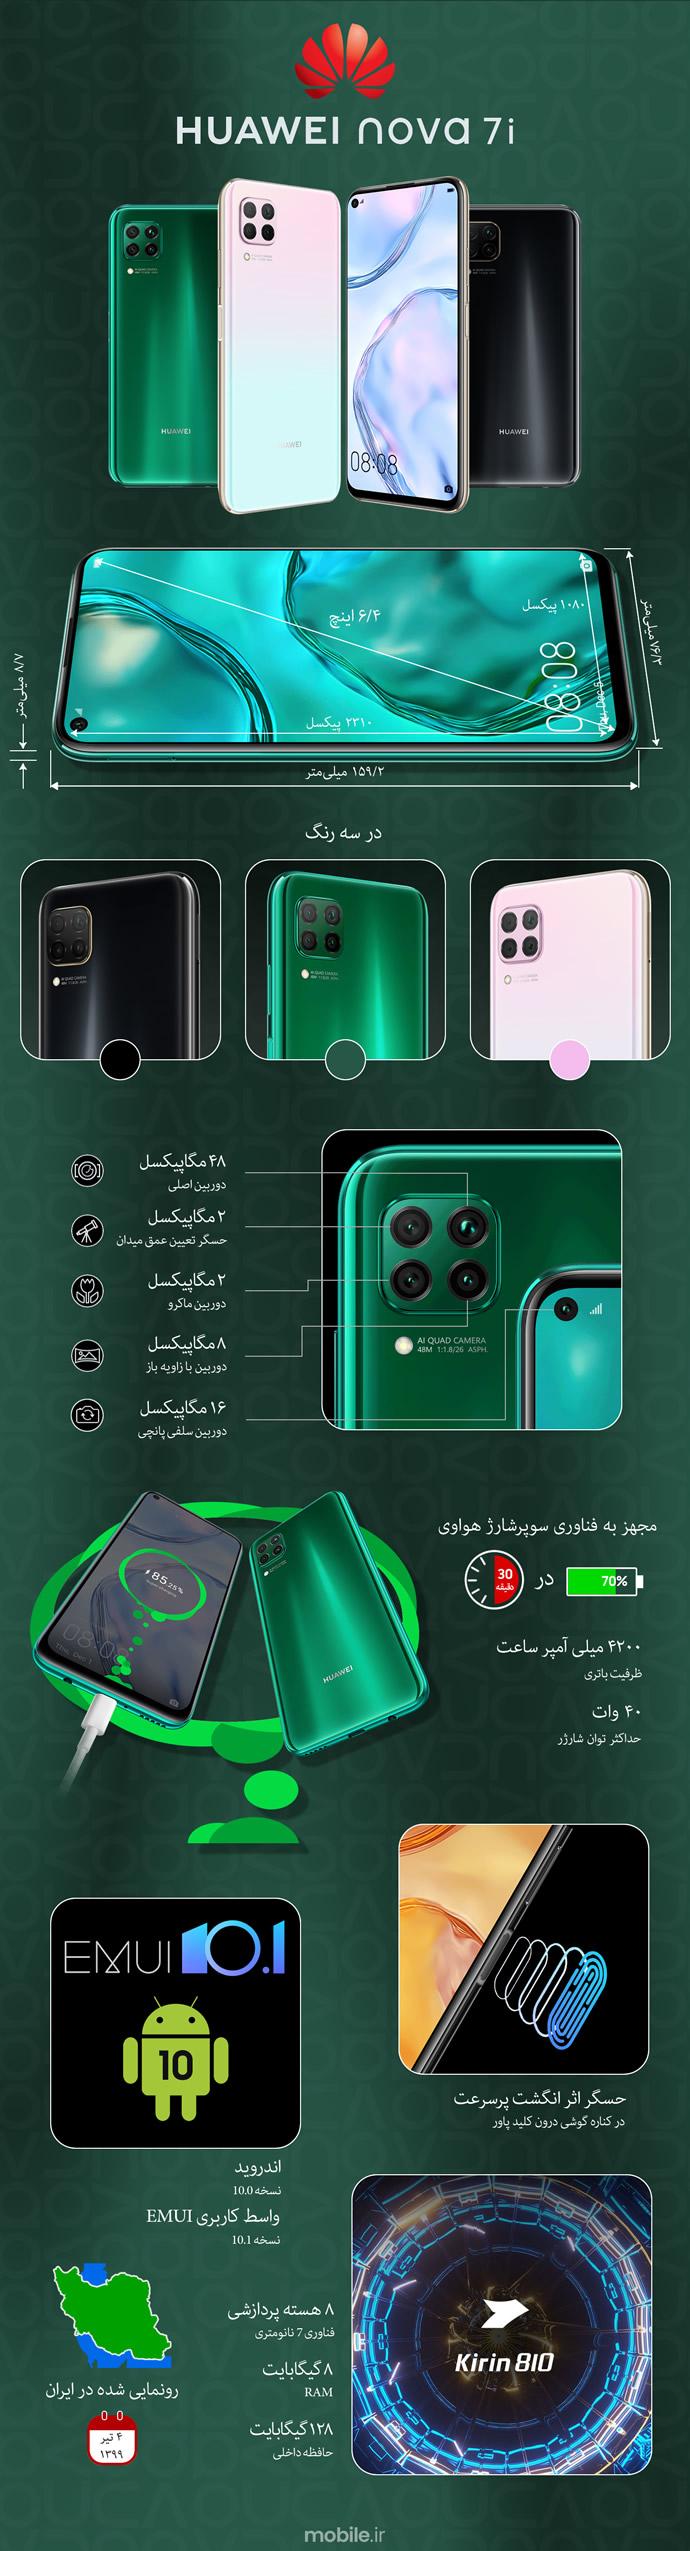 Huawei nova 7i - هواوی نوا 7 آی